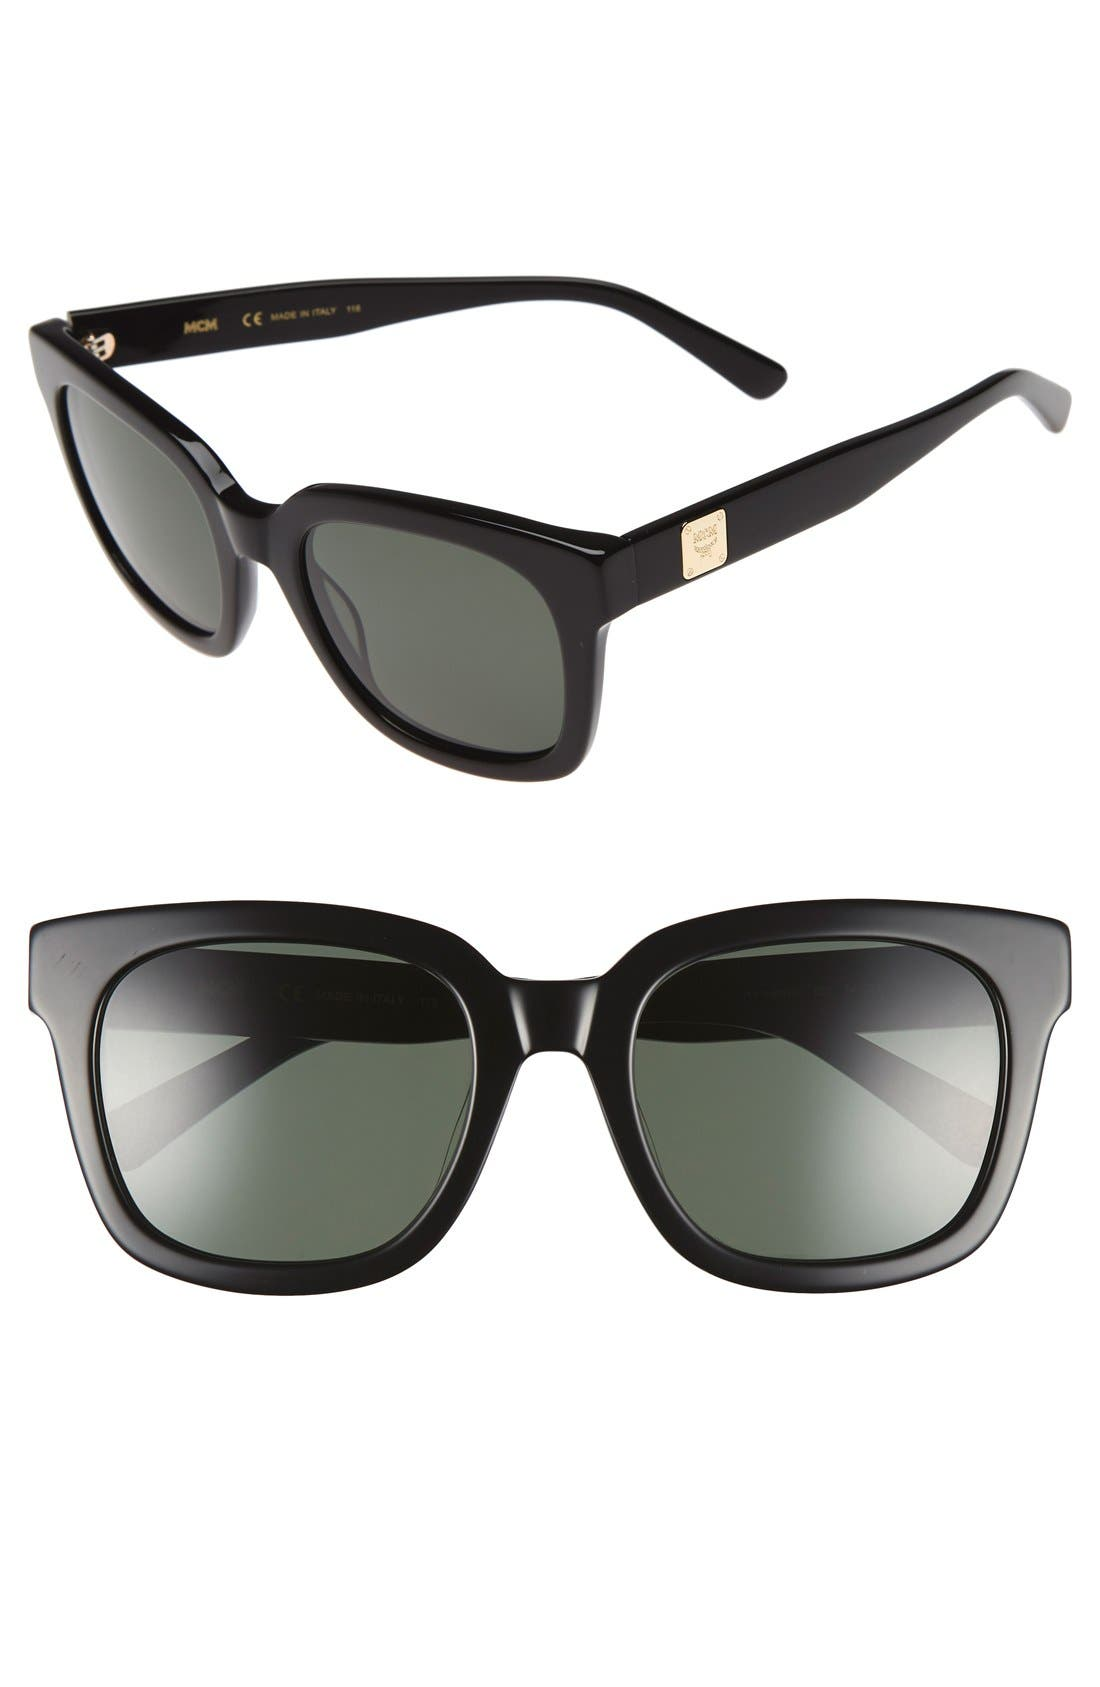 54mm Retro Sunglasses,                             Main thumbnail 1, color,                             001